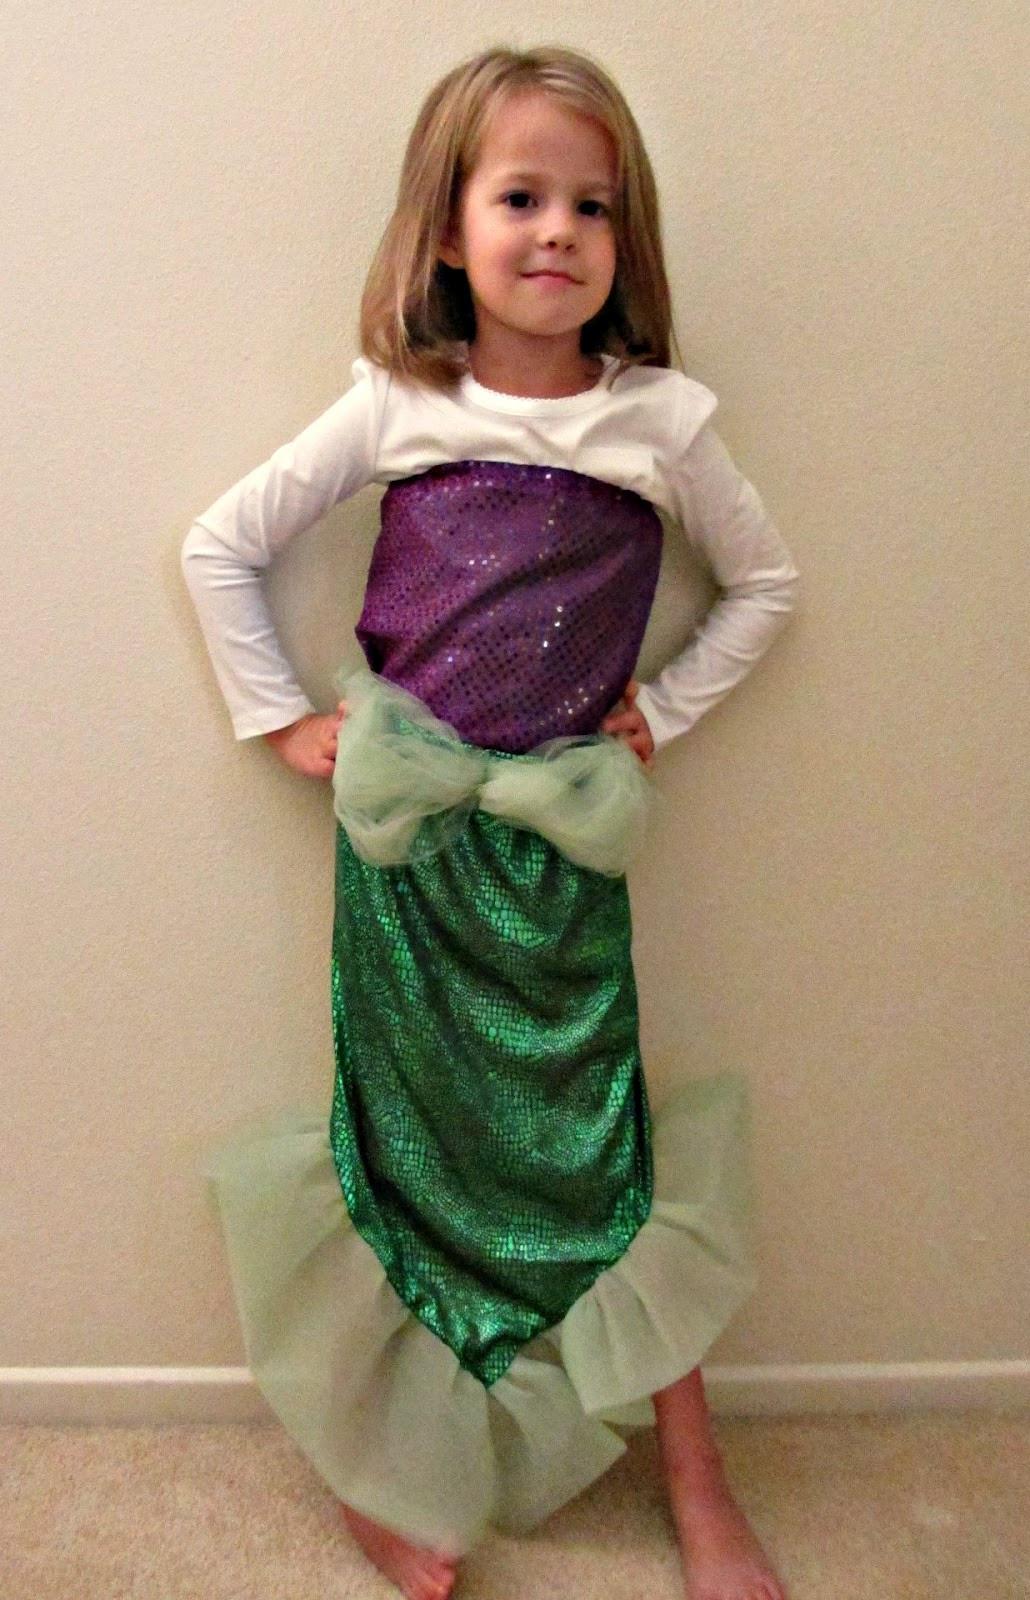 Mermaid Costume DIY  Chadwicks Picture Place Homemade Mermaid Costume